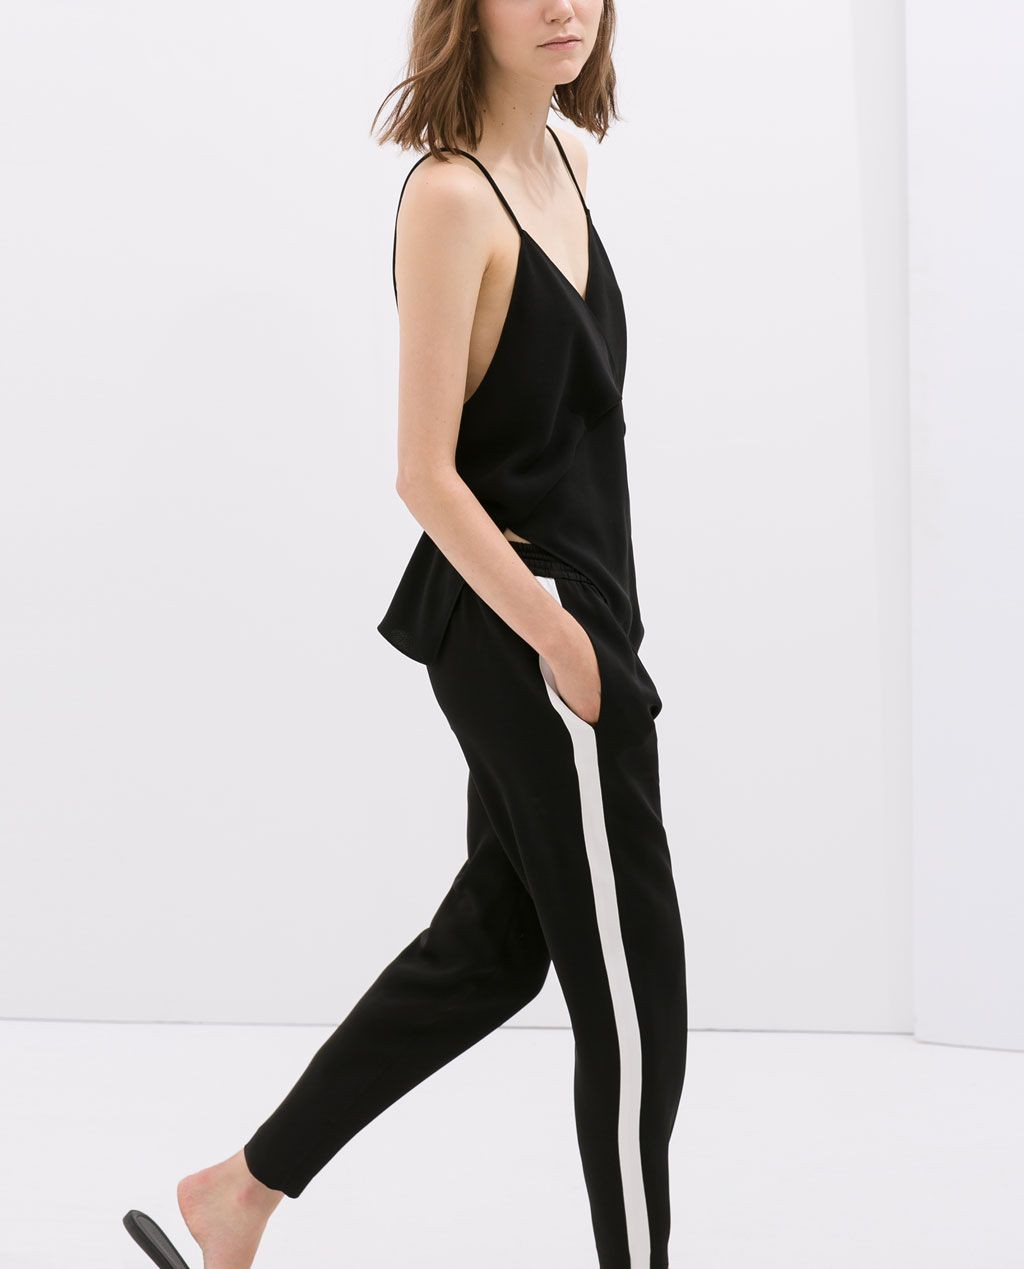 Spodnie z lampasem zara, Formal wear